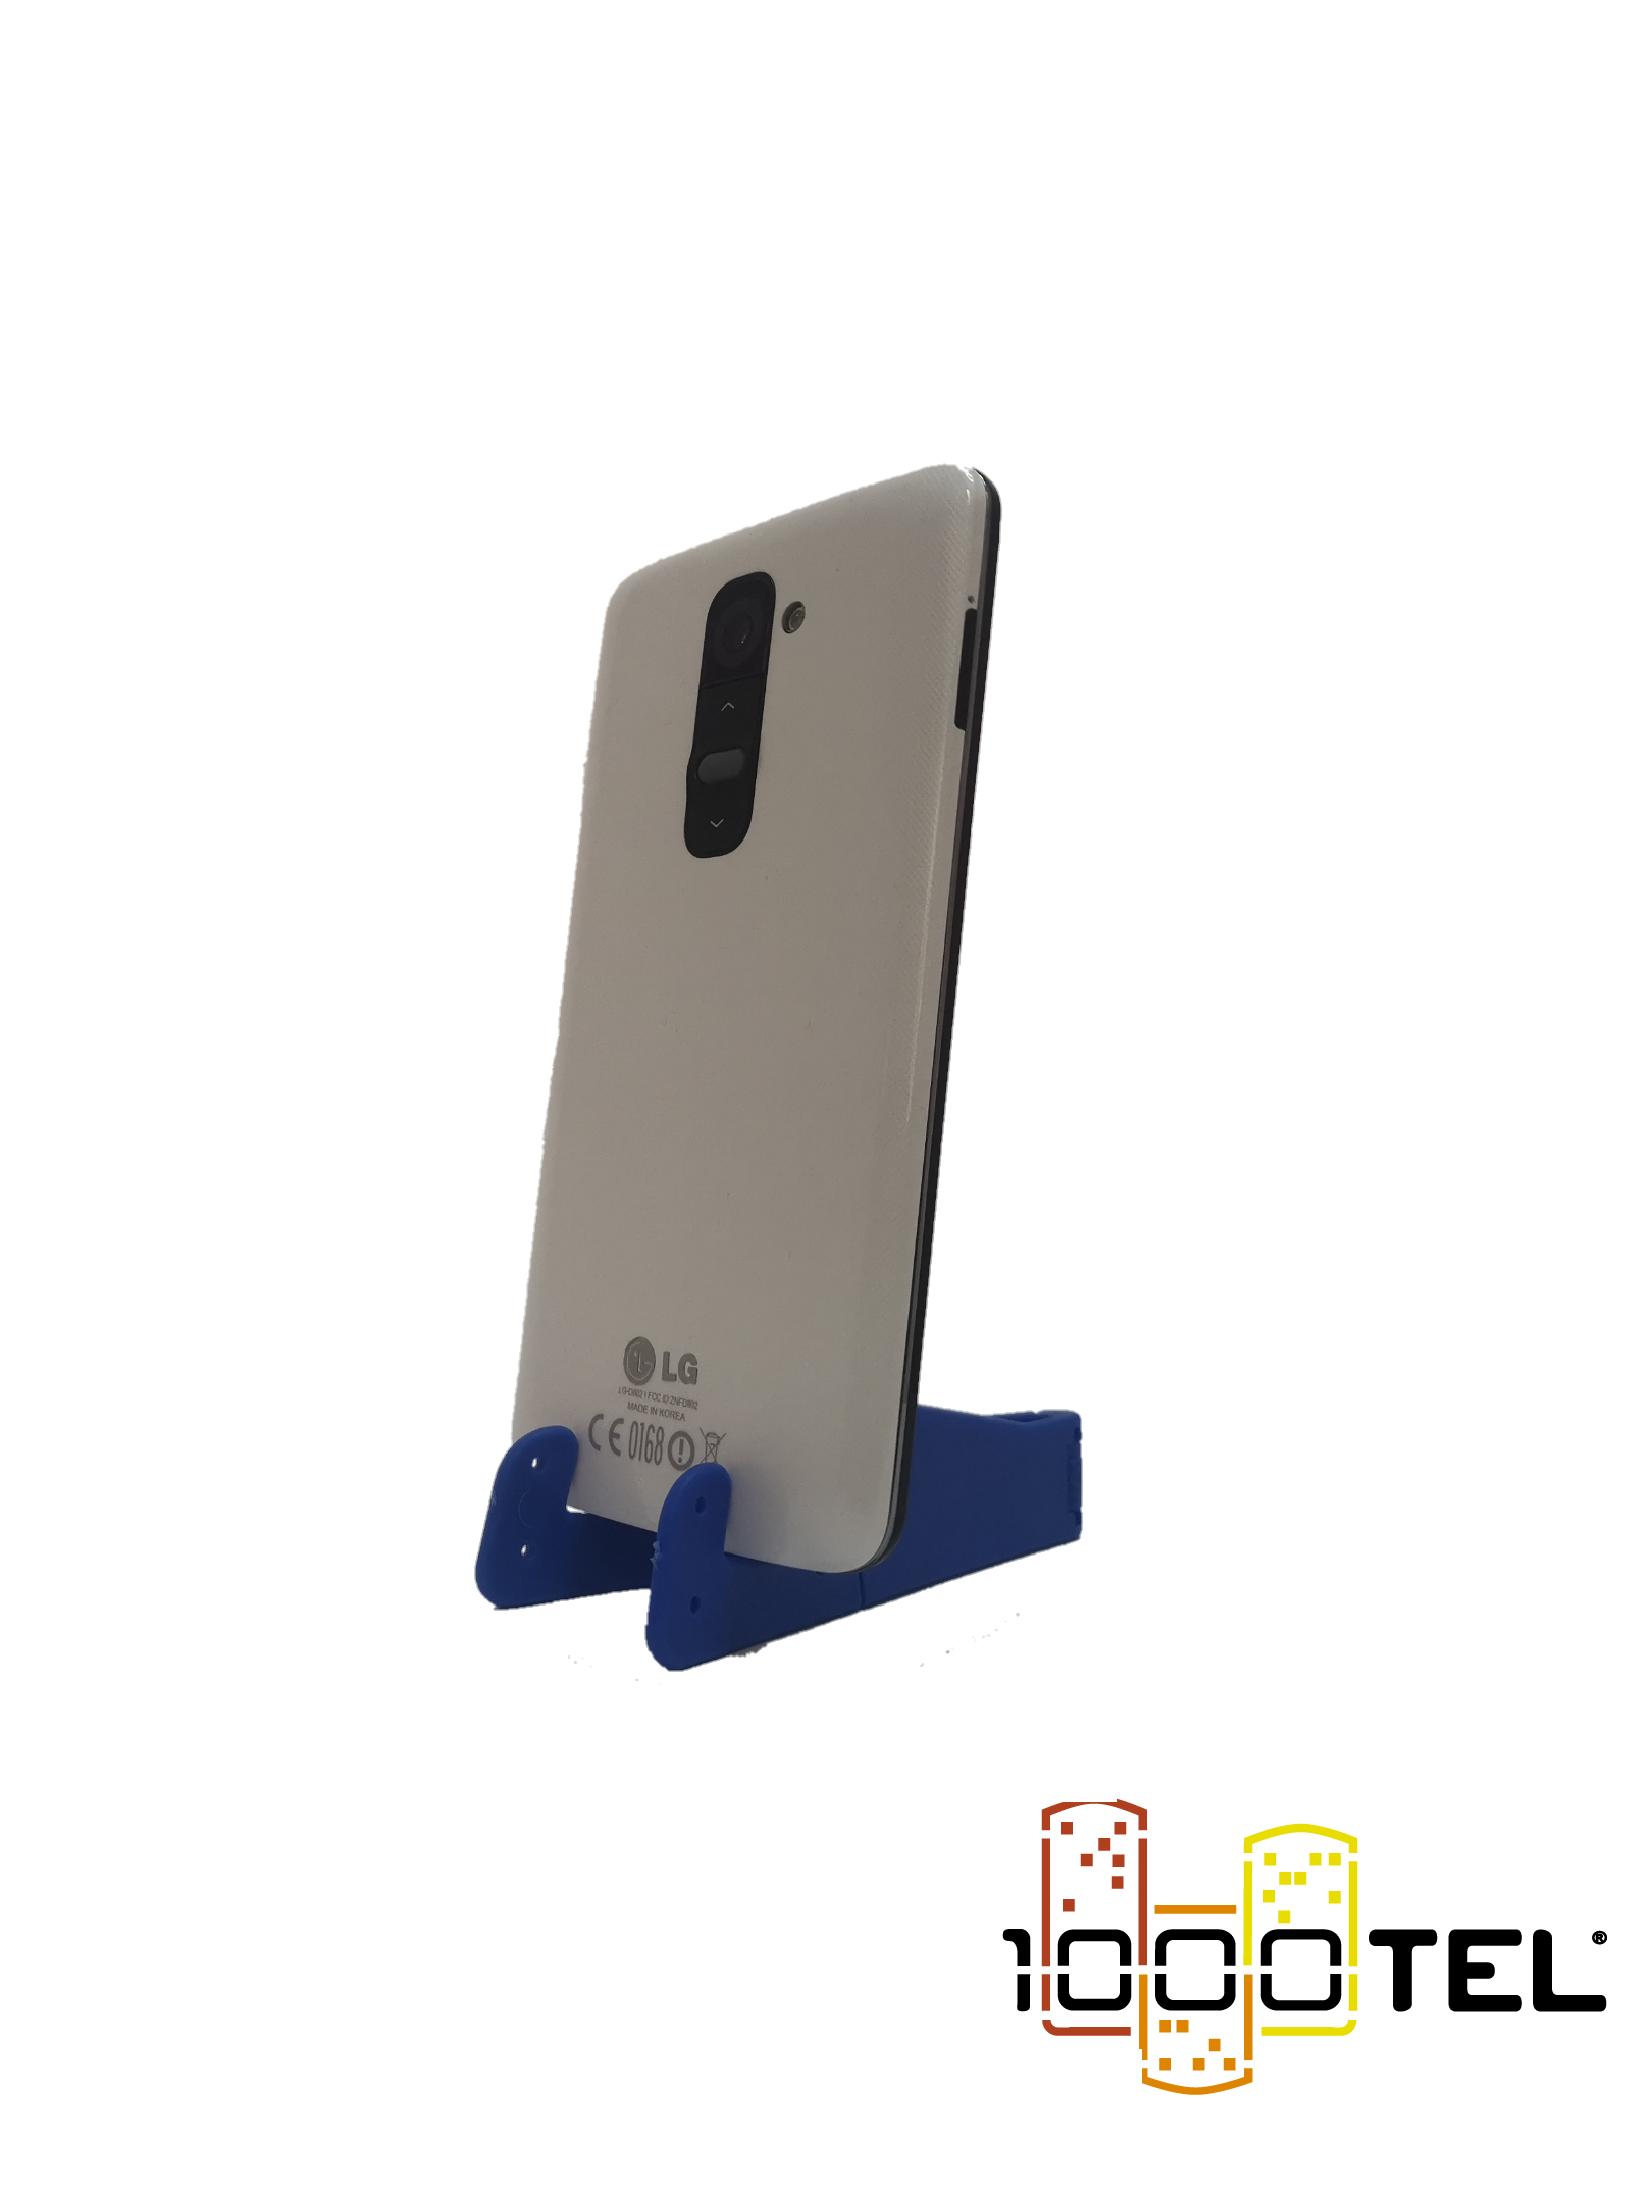 LG G2 #4